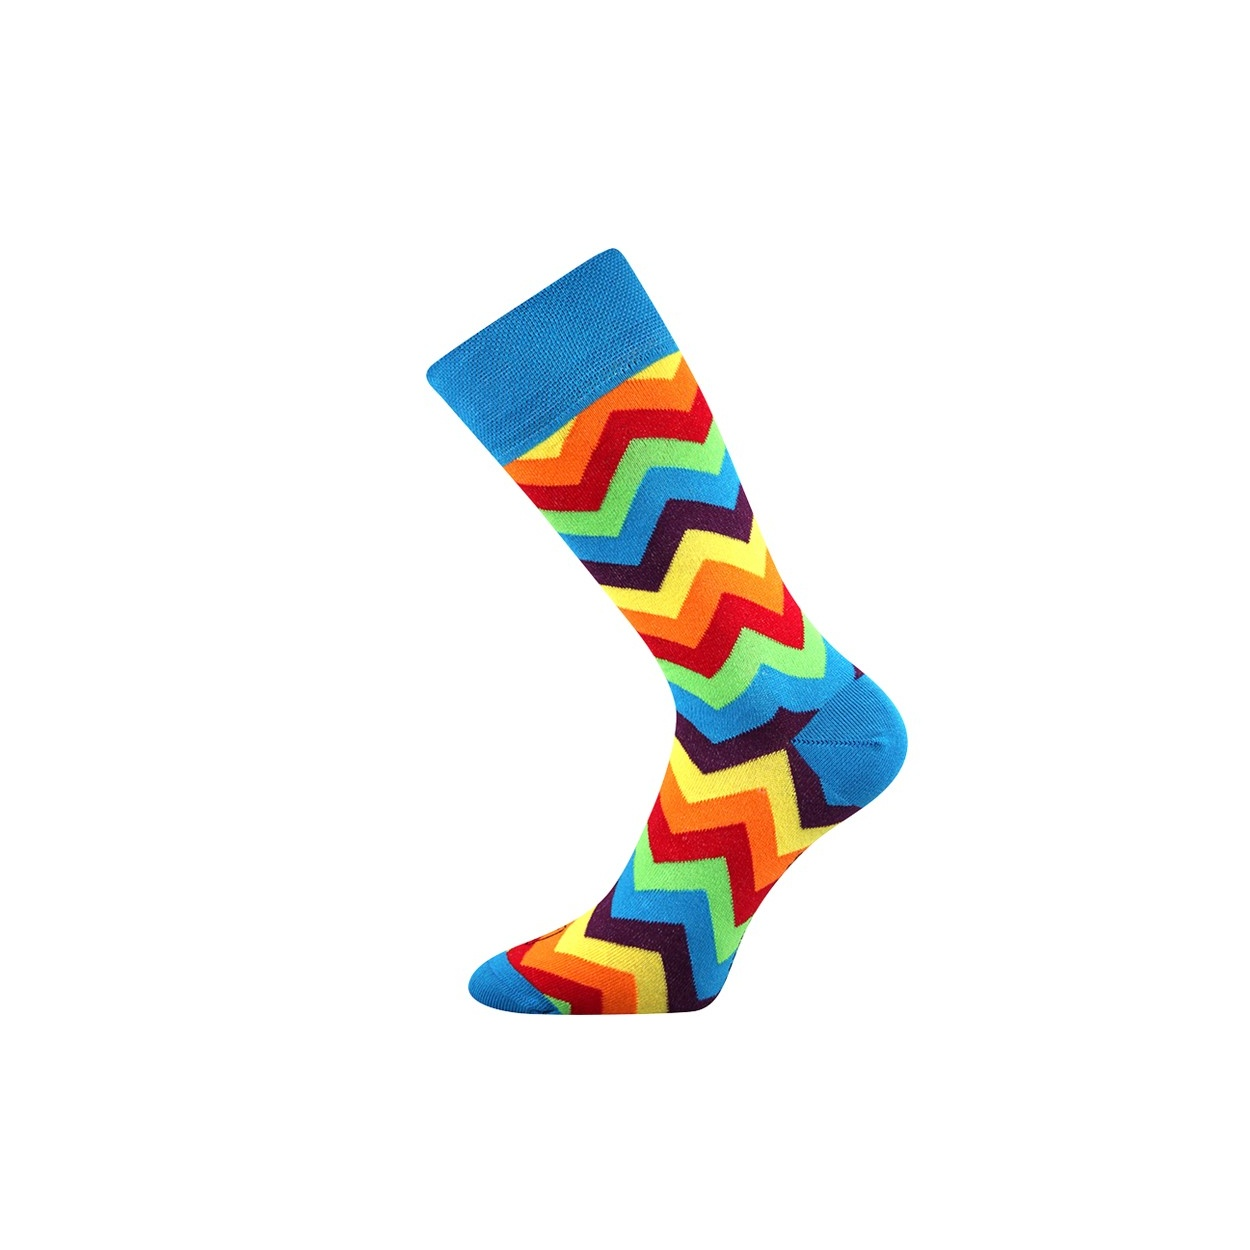 Modré pánské ponožky s klikaticemi WATT